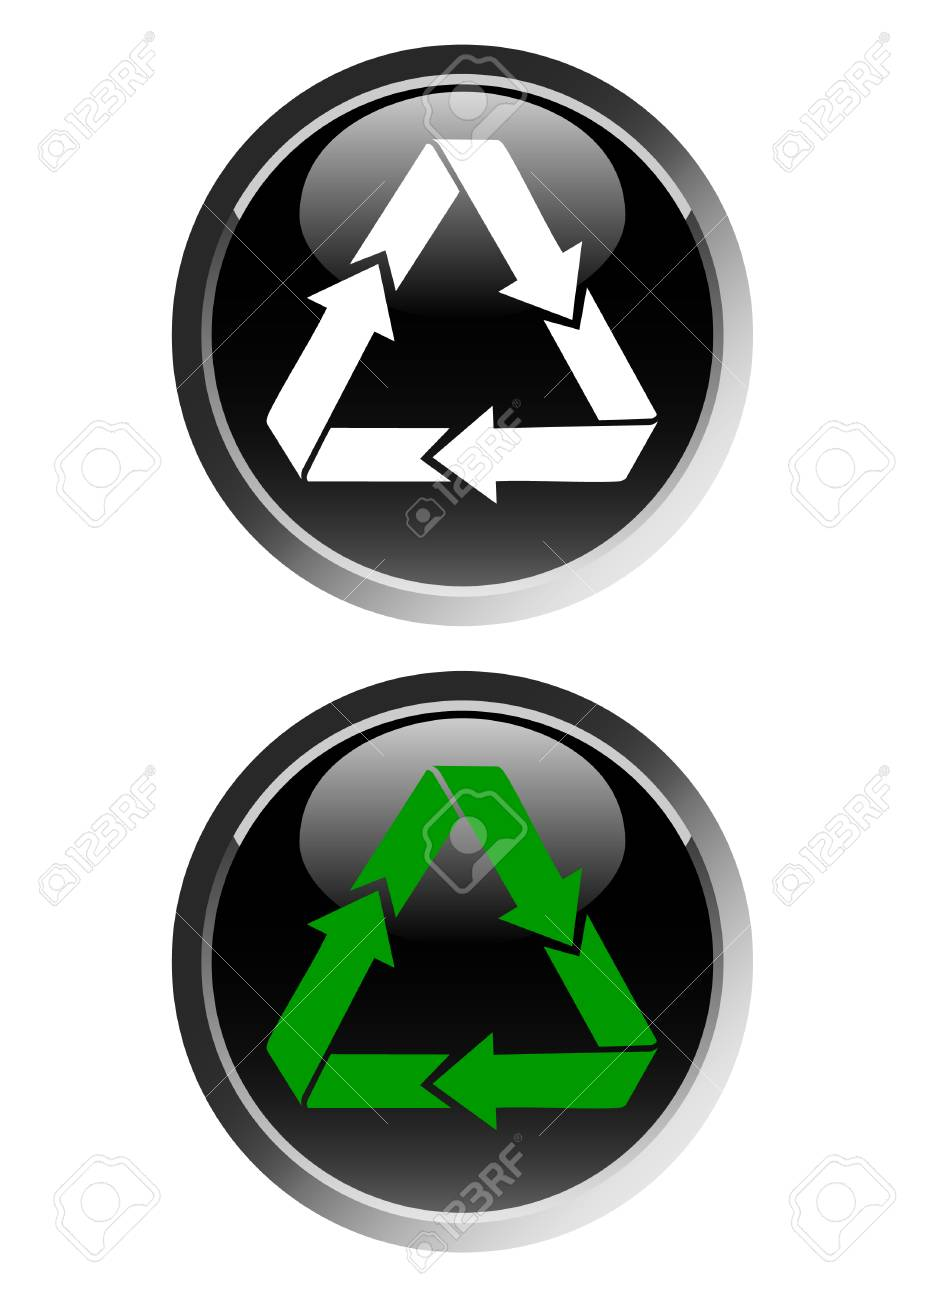 Recycling symbol web icon Stock Vector - 4454298